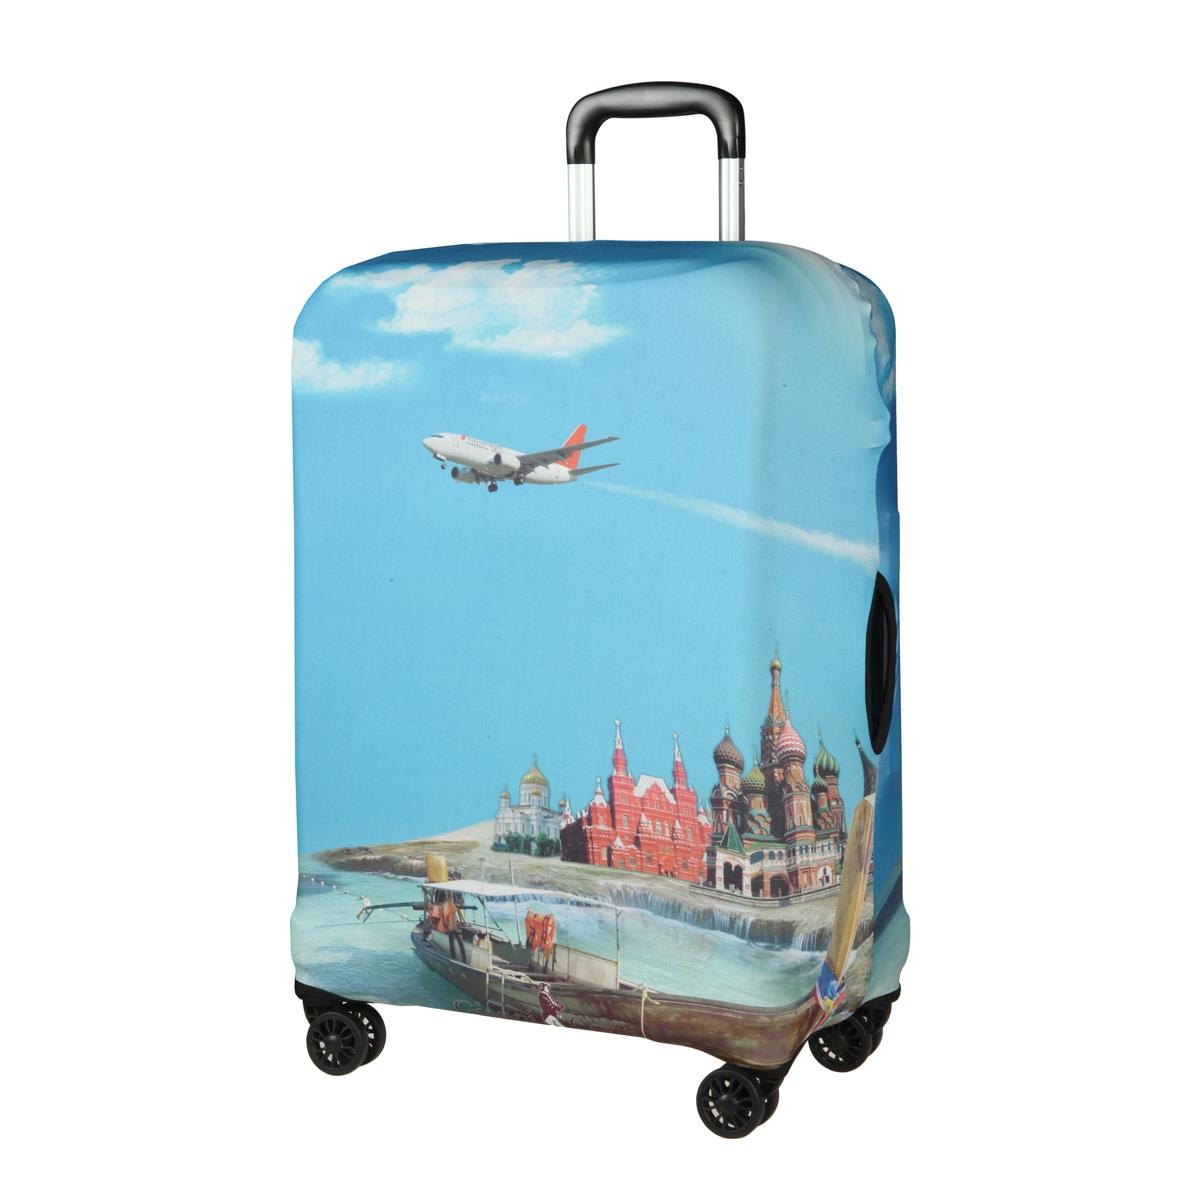 Защитное покрытие для чемодана Gianni Conti 9041 M.